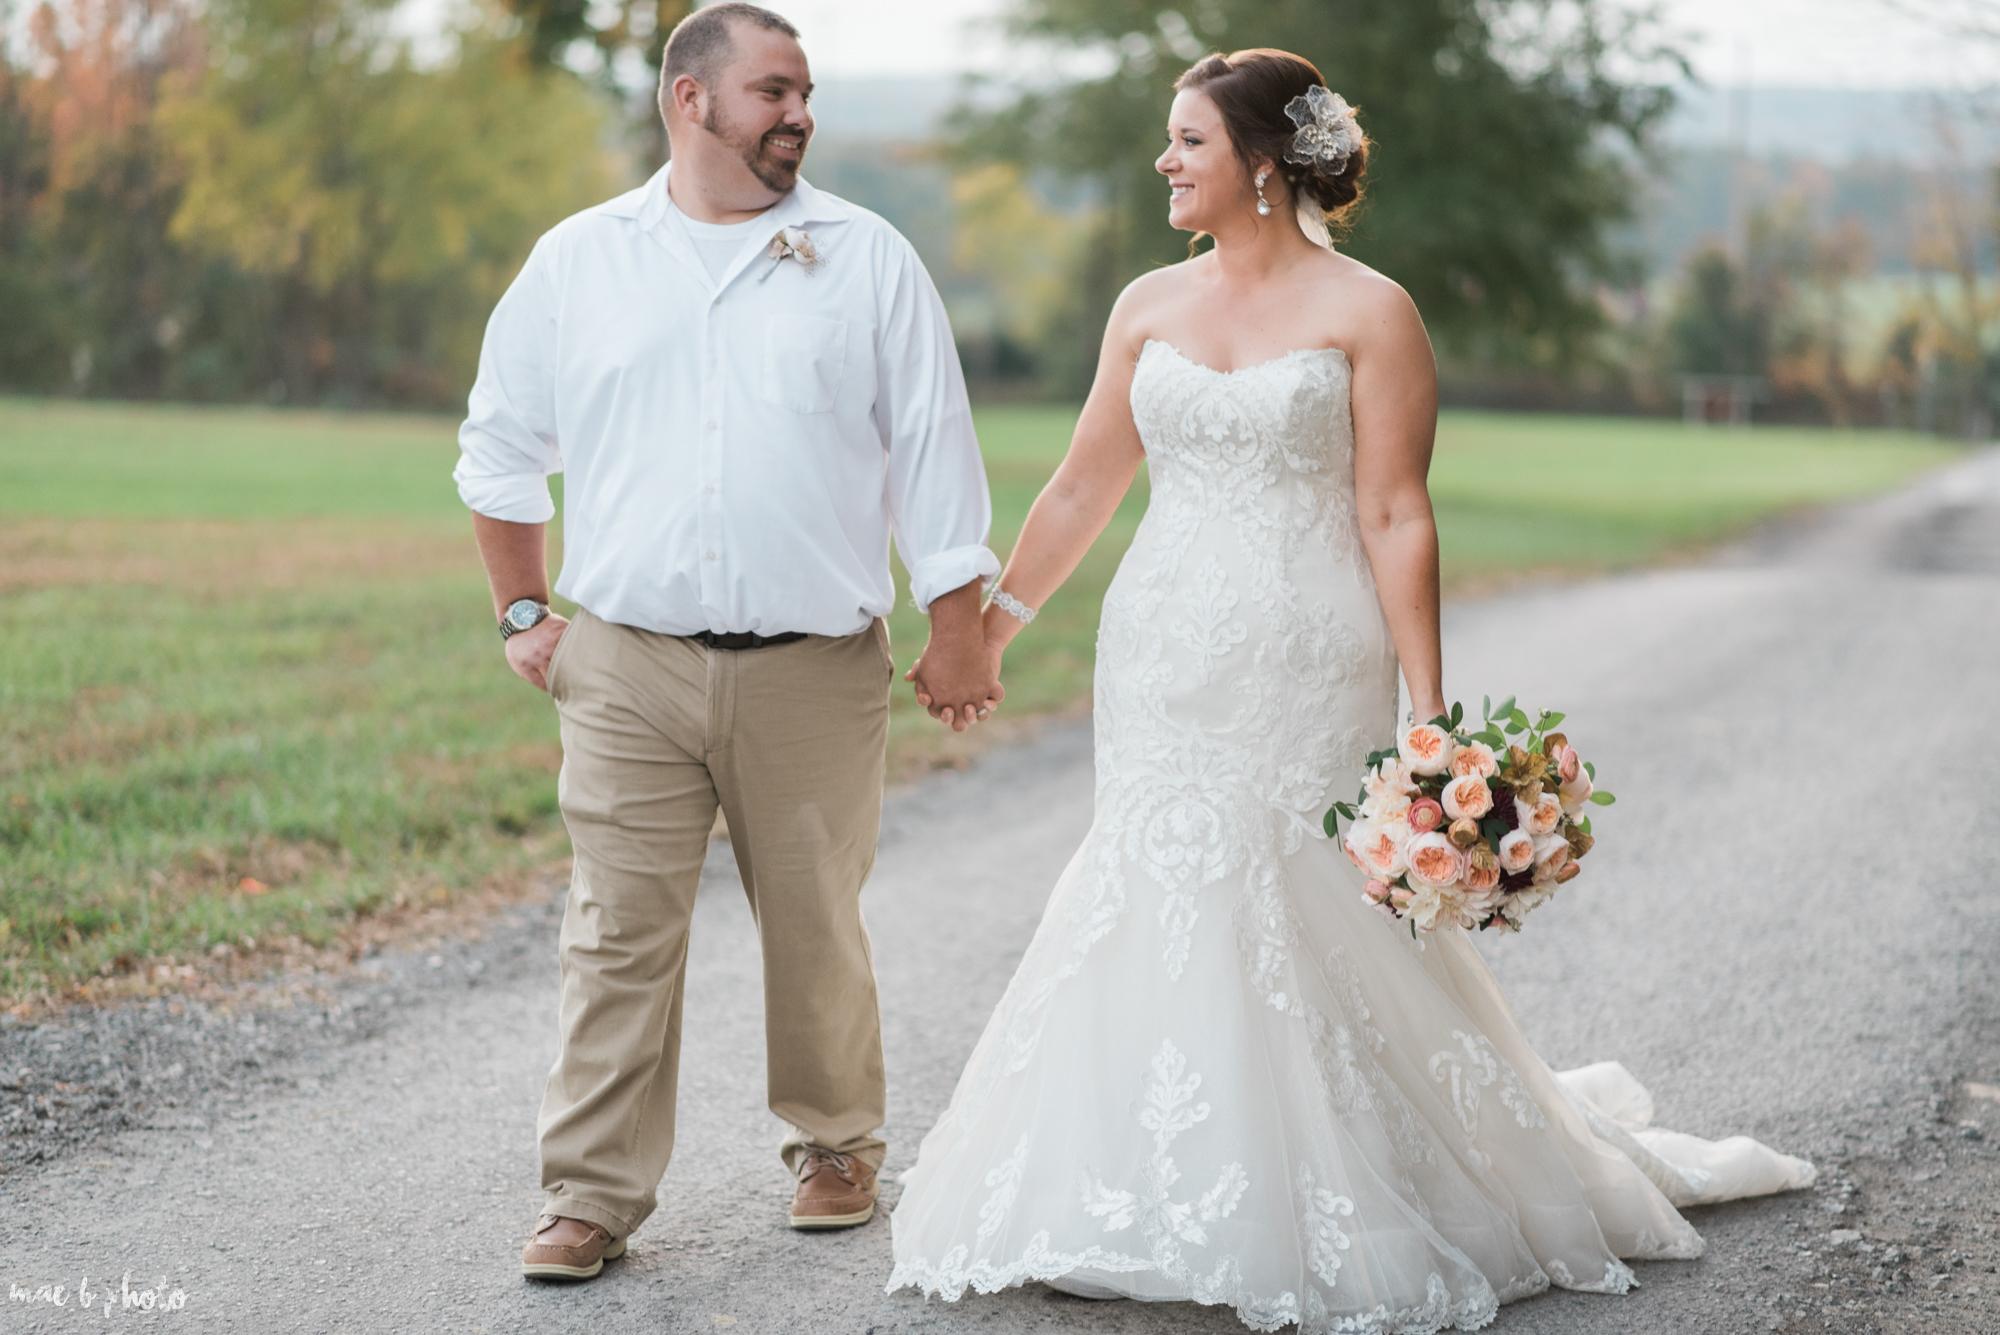 Sarah & Dustin's Rustic Chic Barn Wedding at Hartford Hill Winery in Hartford, Ohio by Mae B Photo-90top.jpg